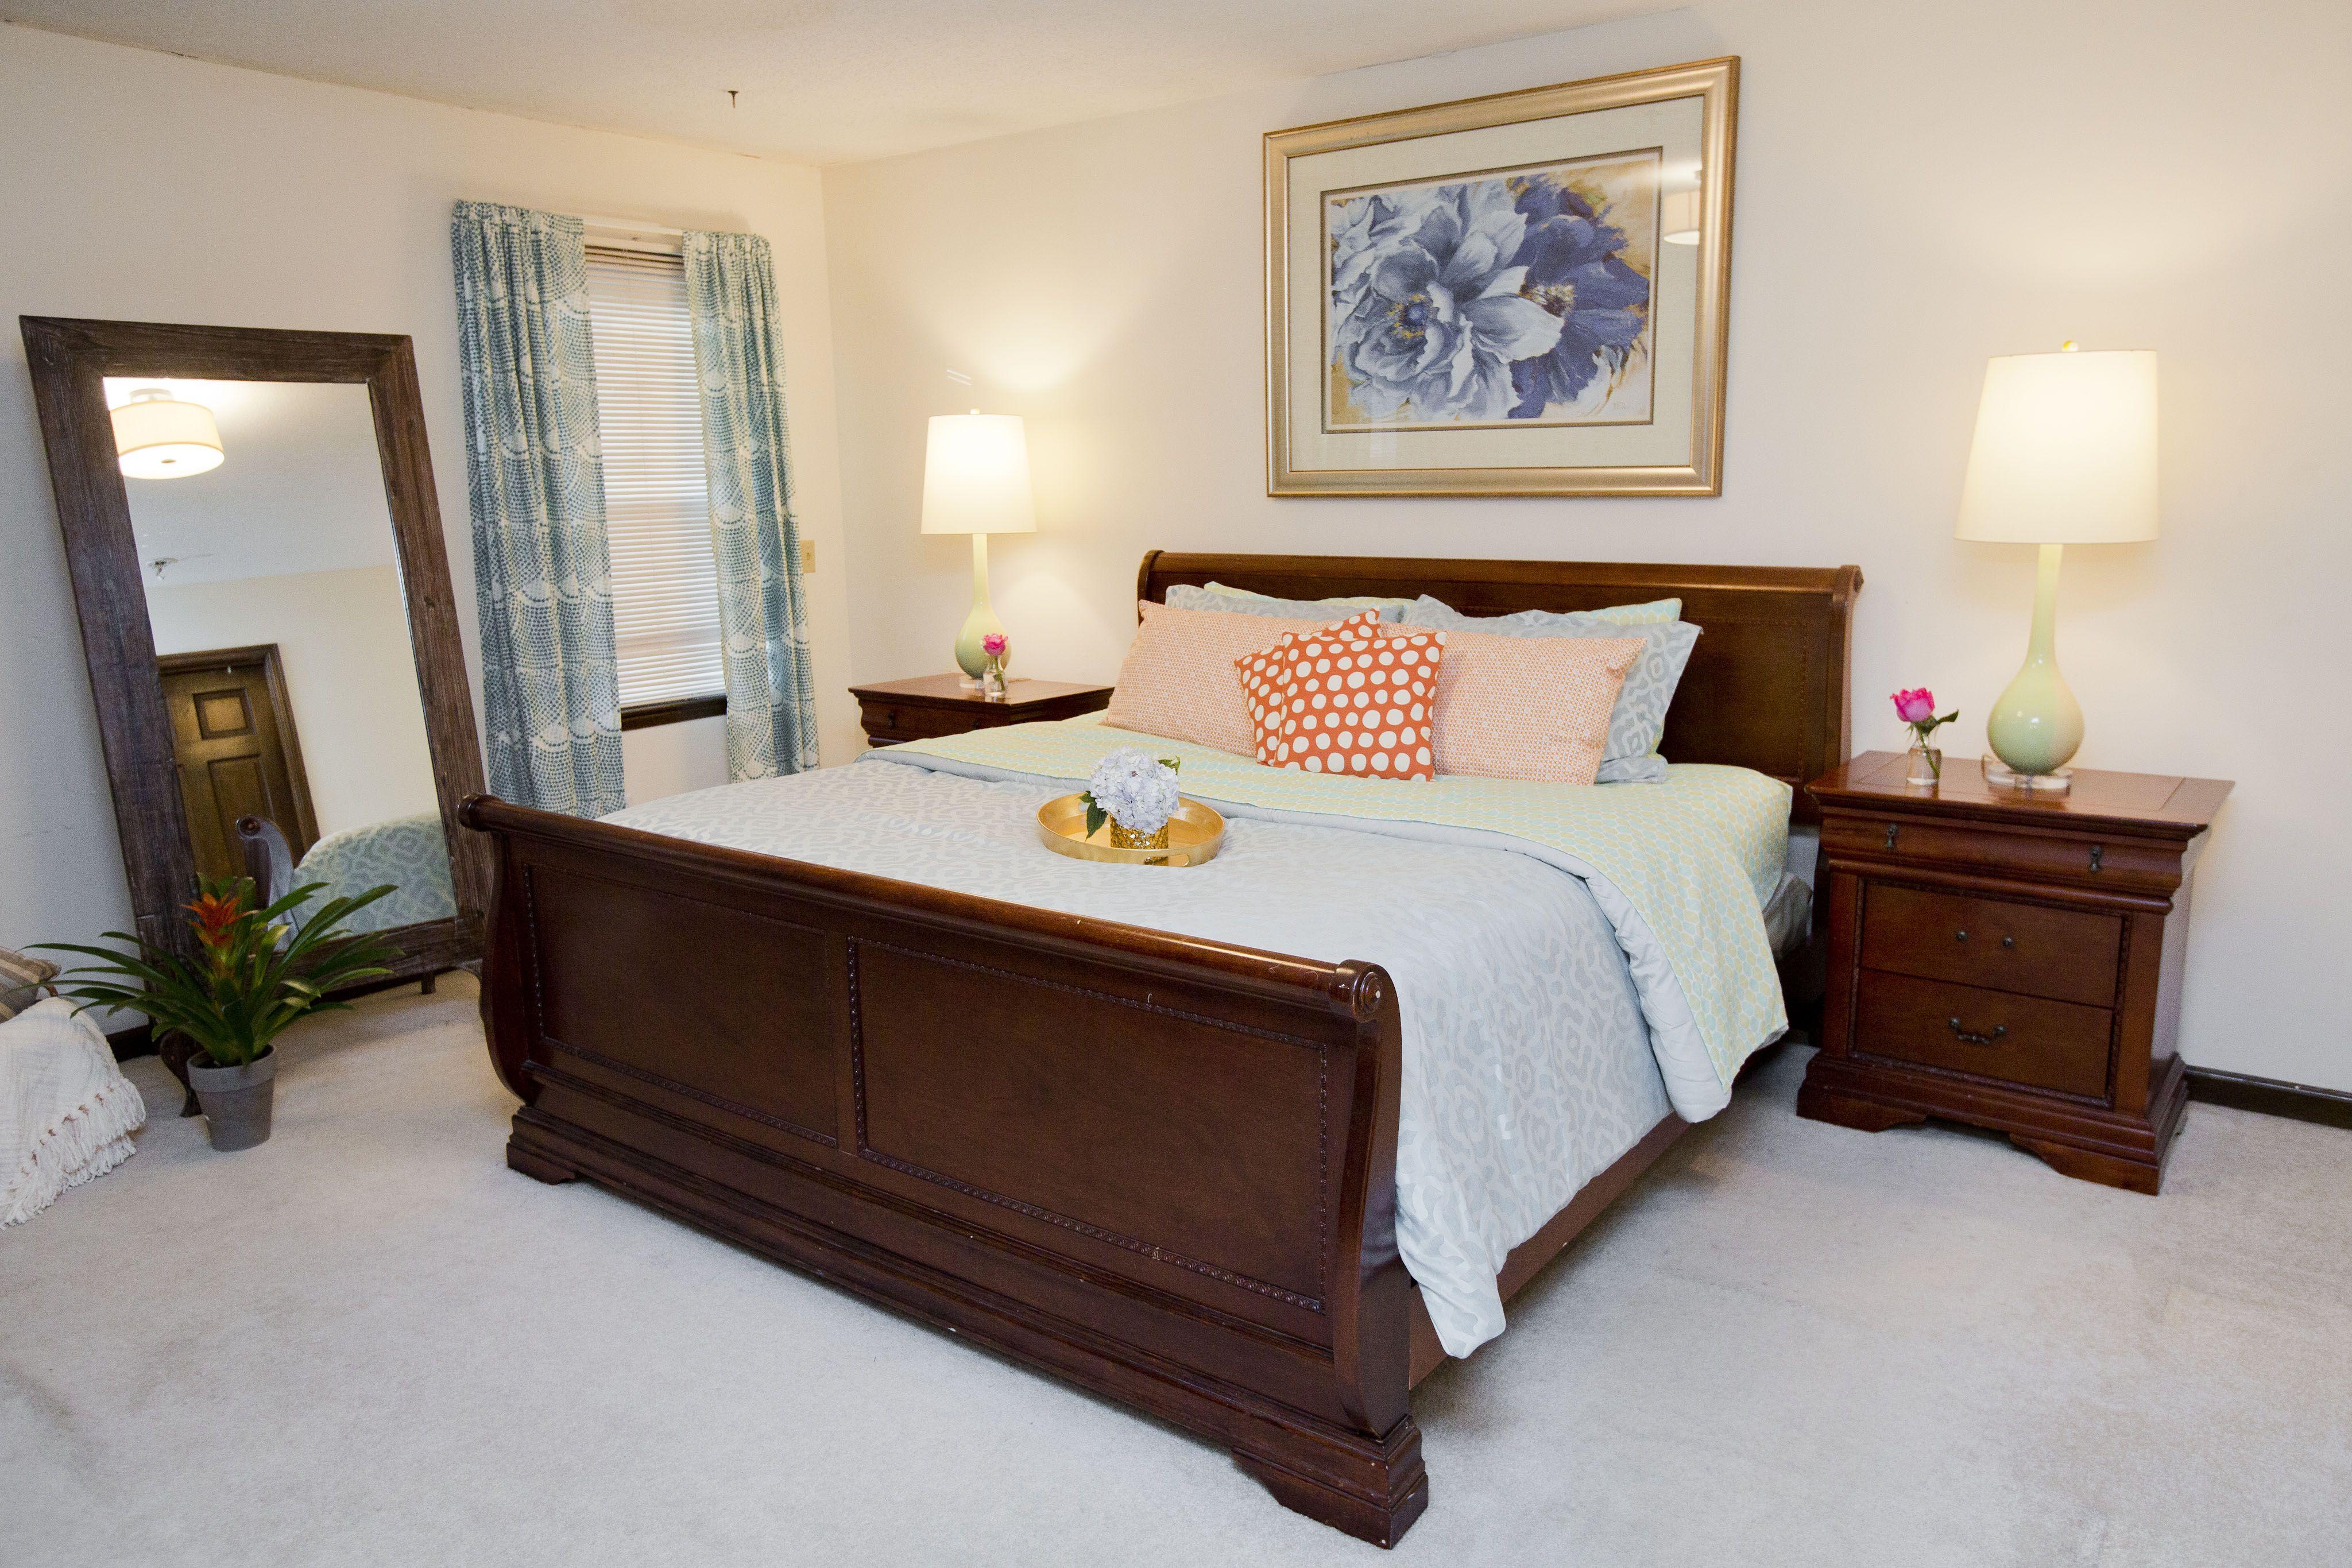 Selling Bedroom Furniture Alisha Kims Bedroom Reveal Buying Selling Abby David